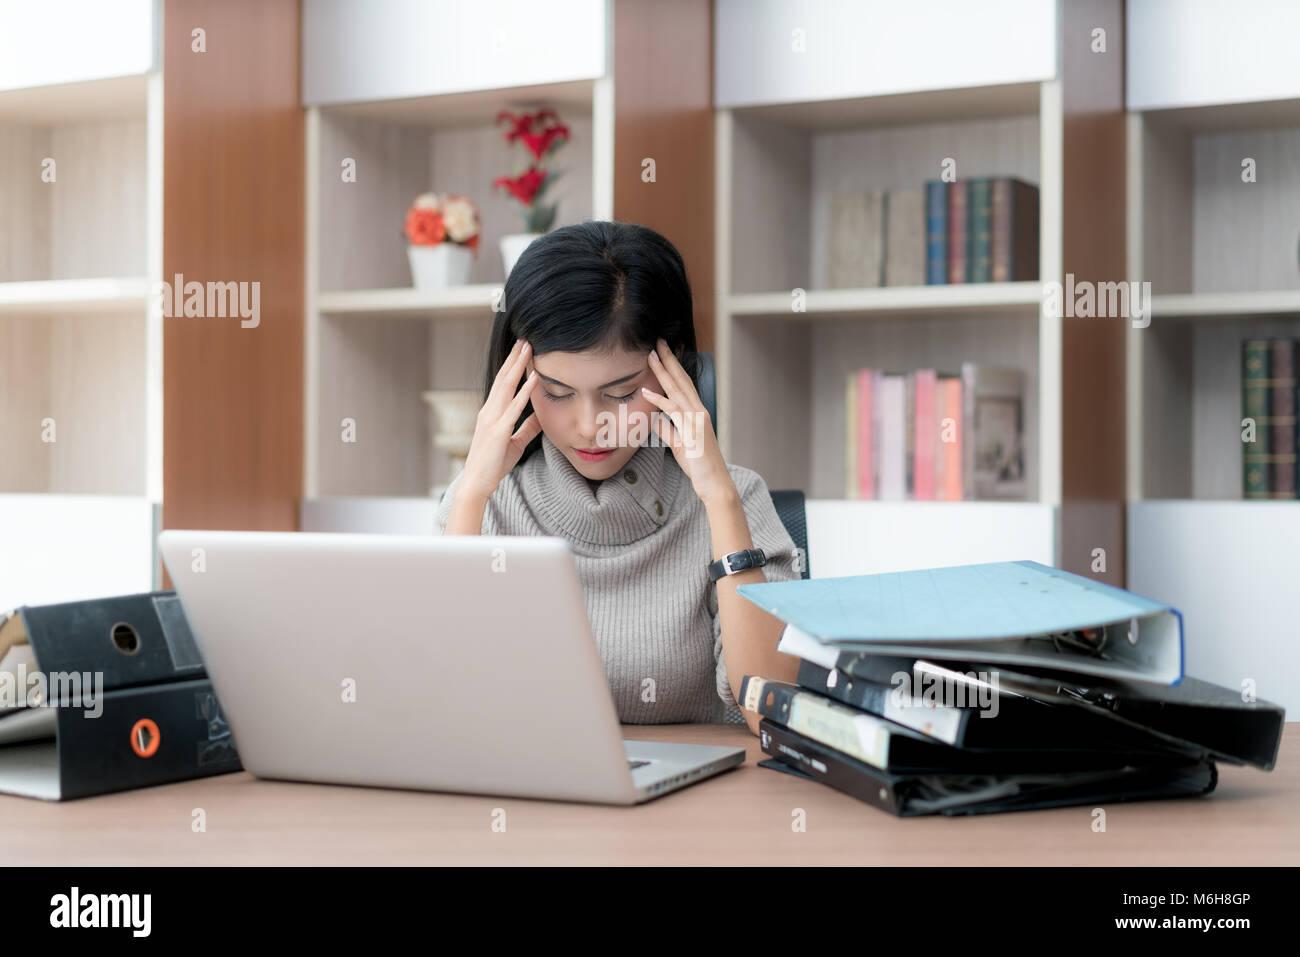 Retrato de cansado joven mujer de negocios asiáticos sensación de estrés de un montón de trabajo. Imagen De Stock